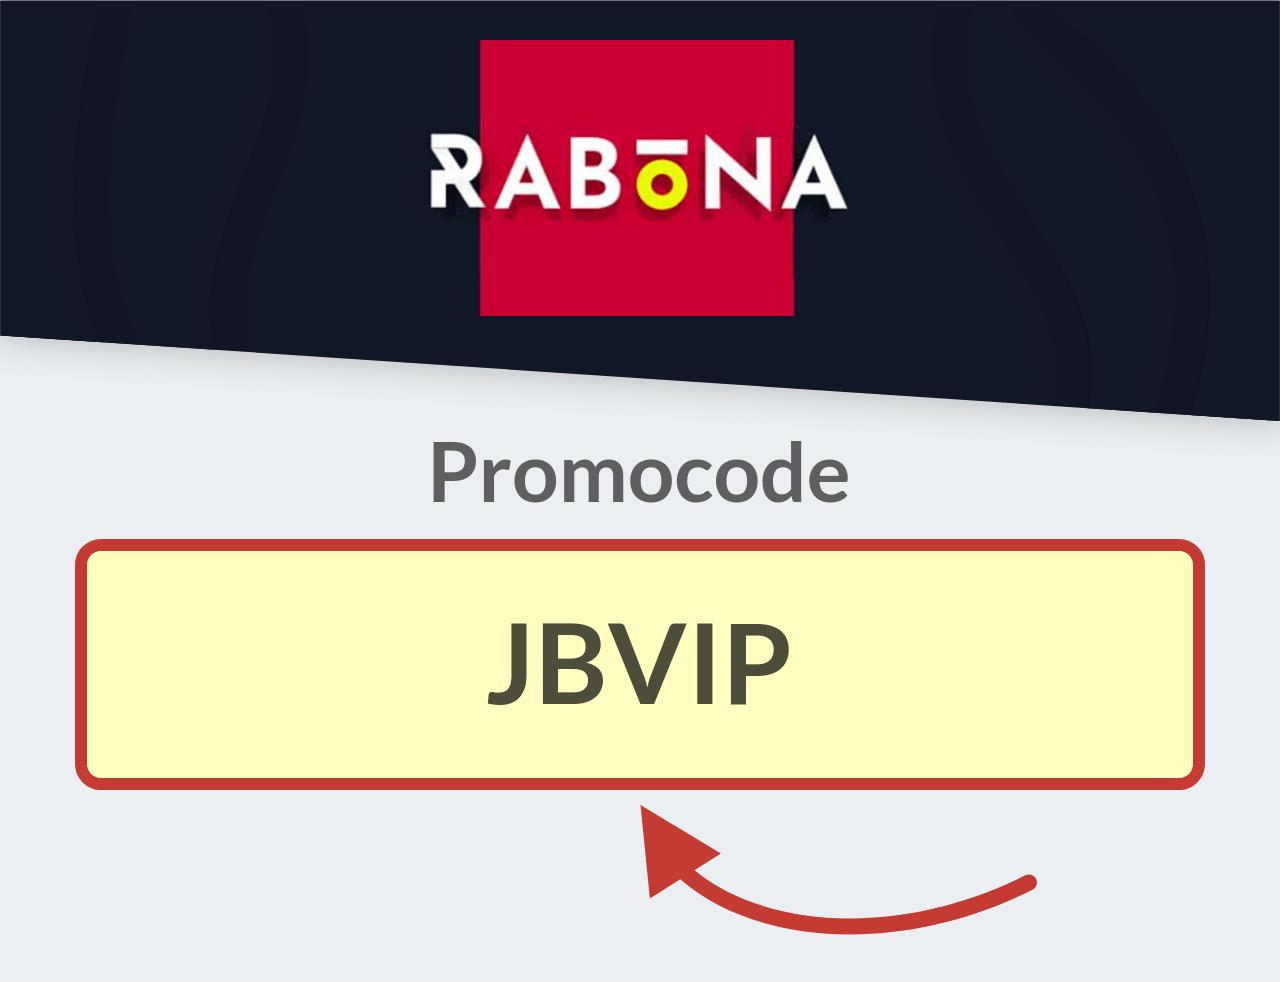 Rabona Promo Code